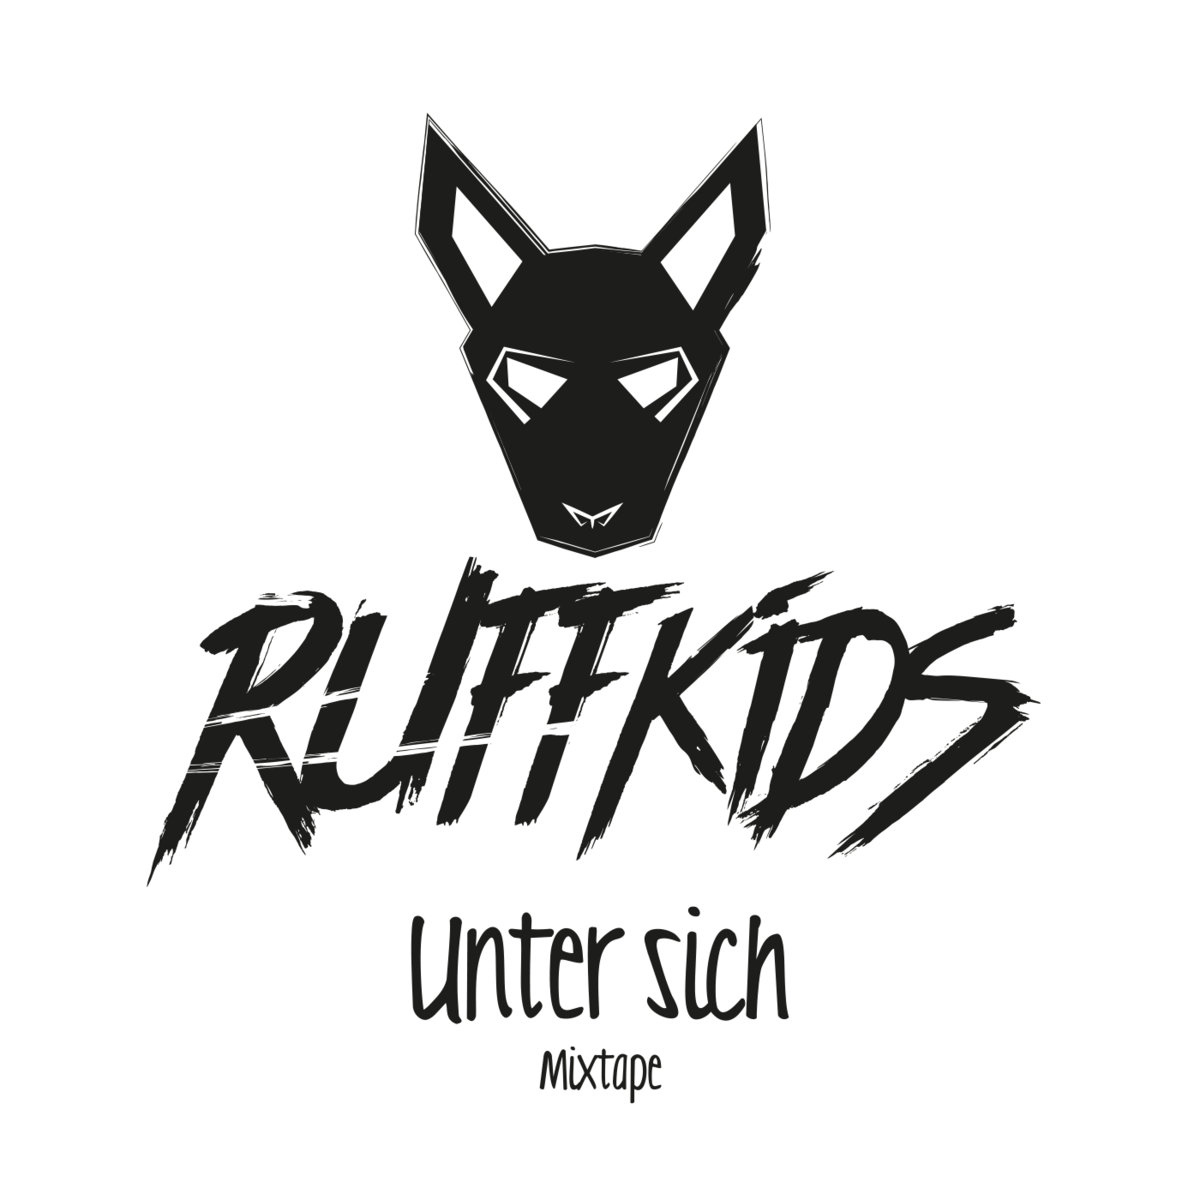 Upcoming: Ruffkids - Ruffkids Unter Sich